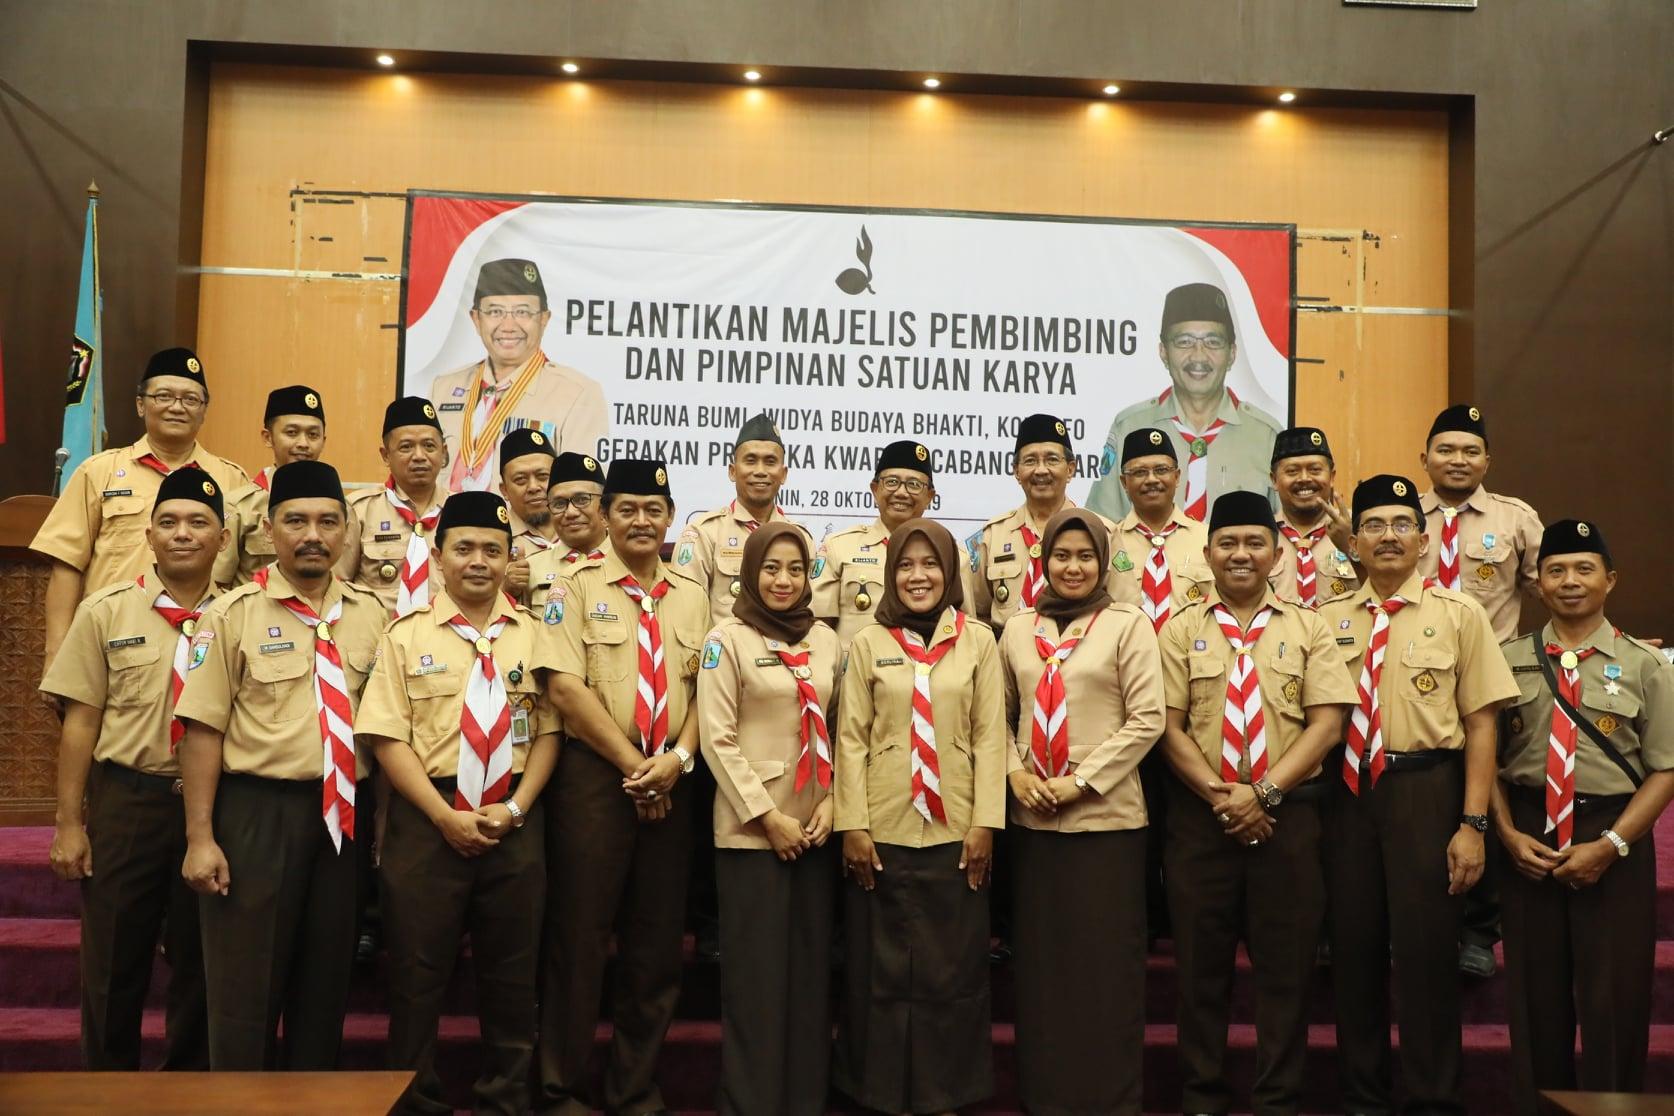 Pelantikan Majelis Pembimbing dan Pimpinan Saka Gerakan Pramuka Kwarcab Blitar